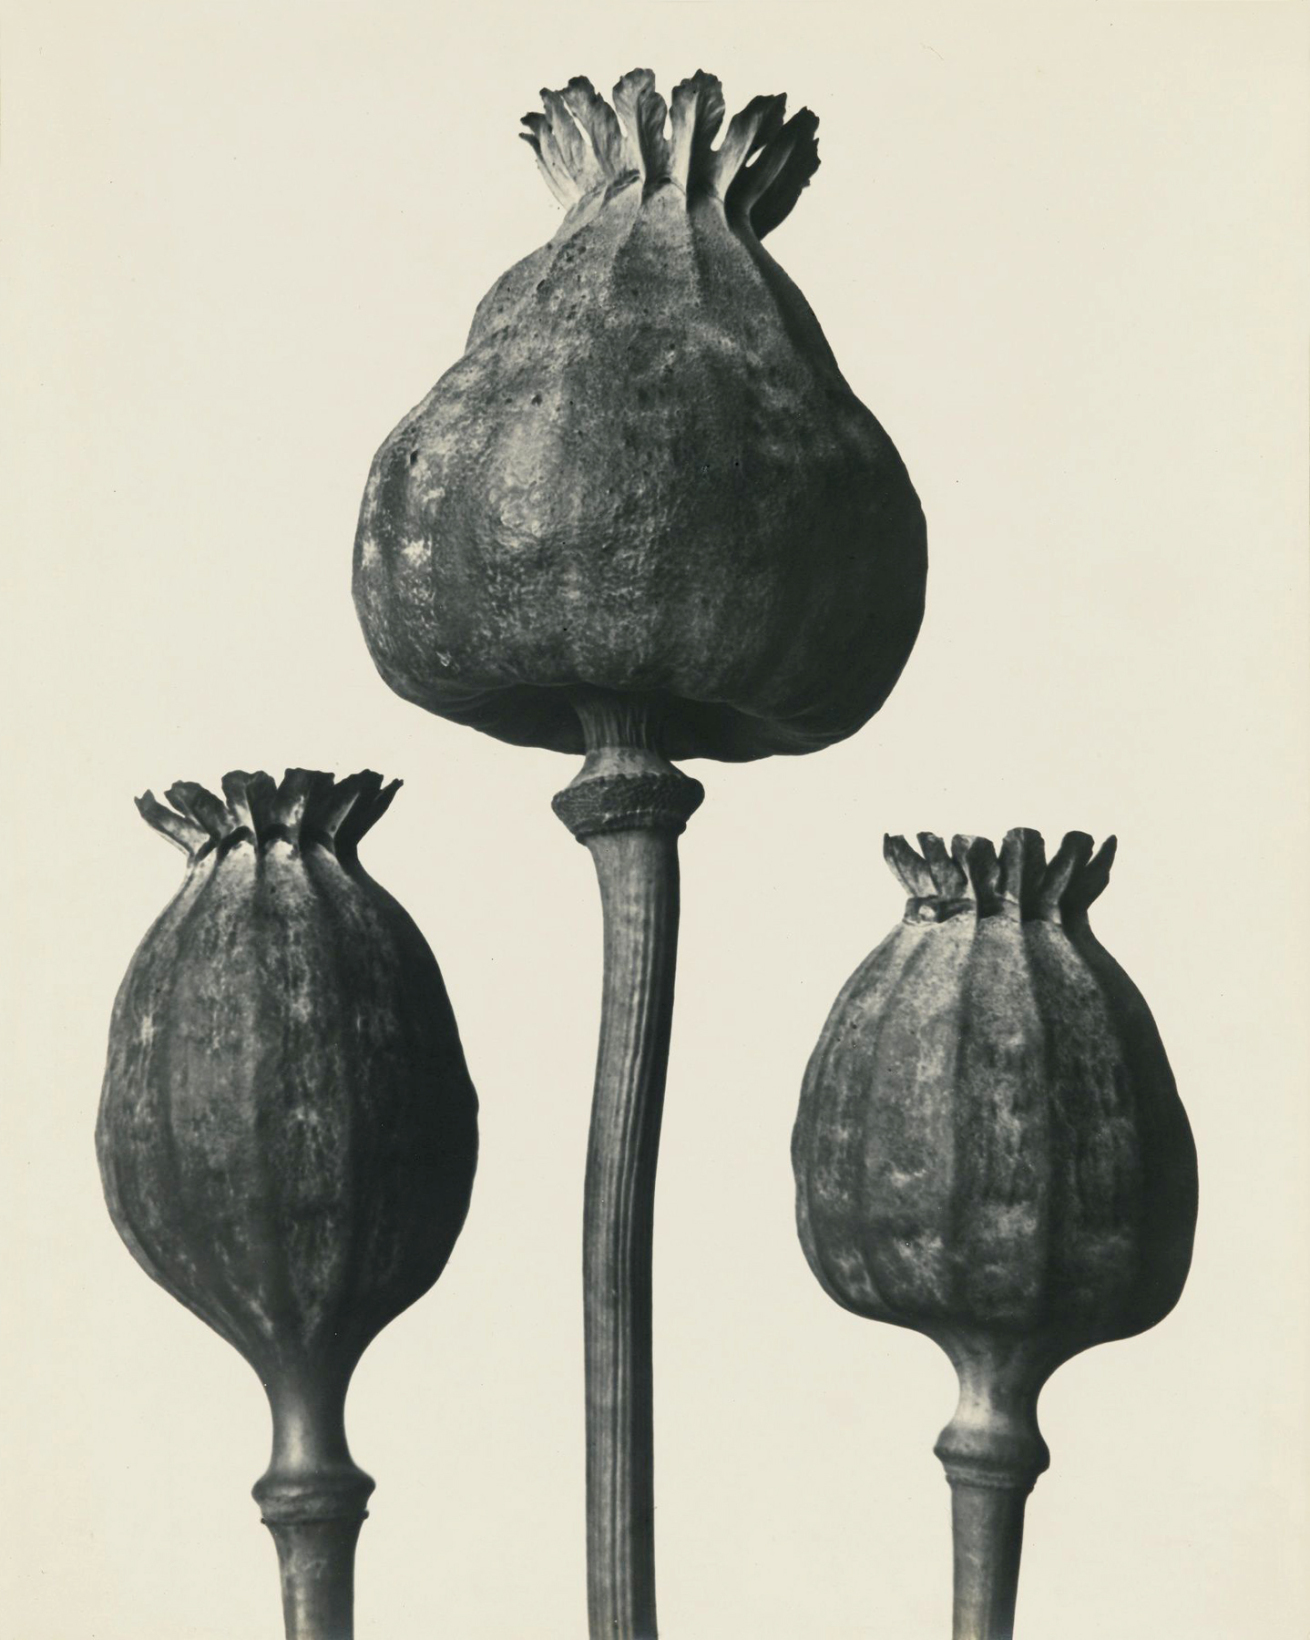 Fotó: Karl Blossfeldt: Papaver Orientalis, Keleti mák, 1928 előtt <br />Karl Blossfeldt Collection at the University of the Arts Berlin